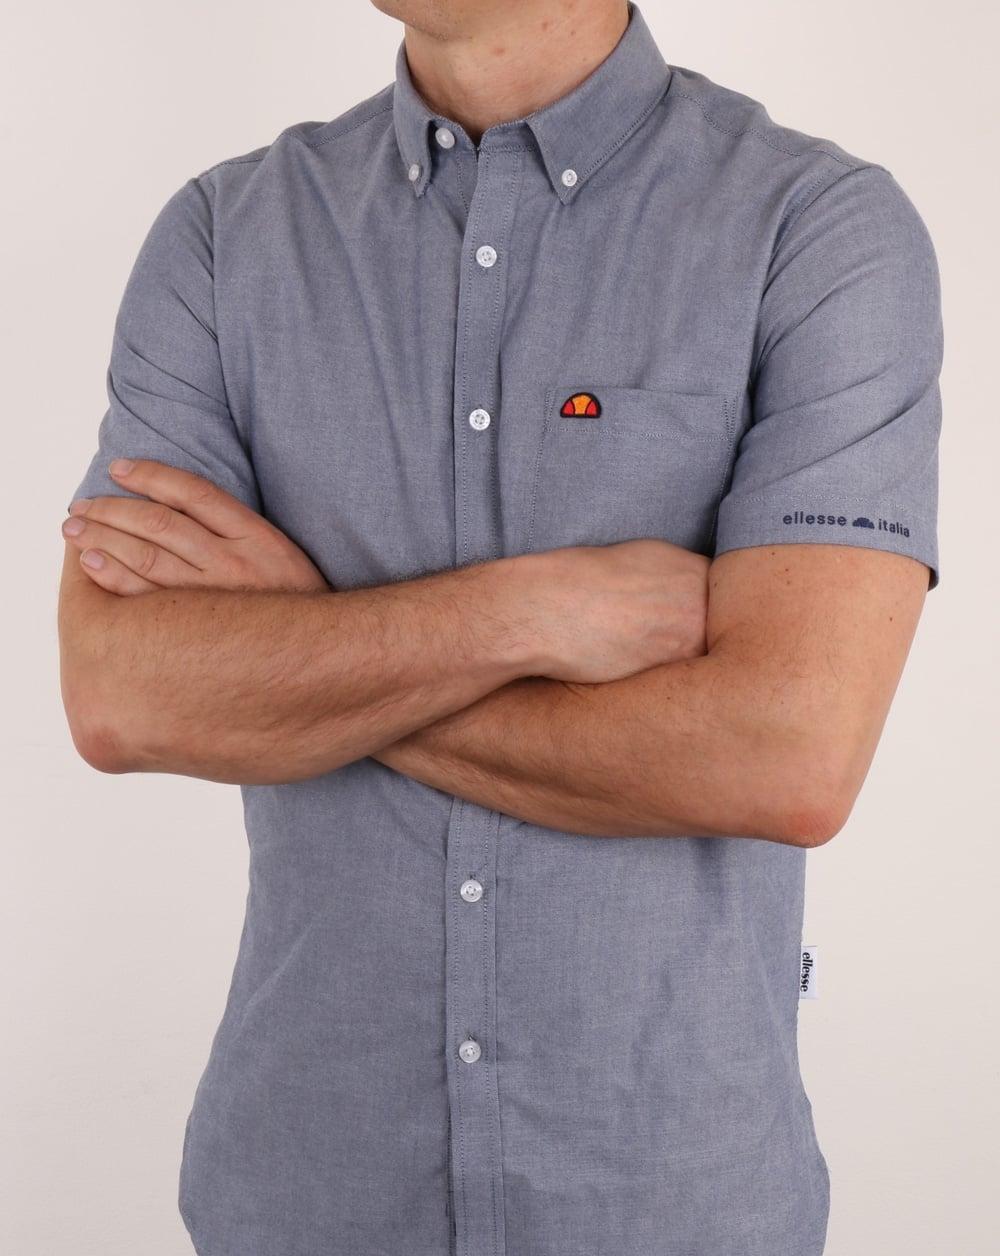 ellesse pockert shirt short sleeve